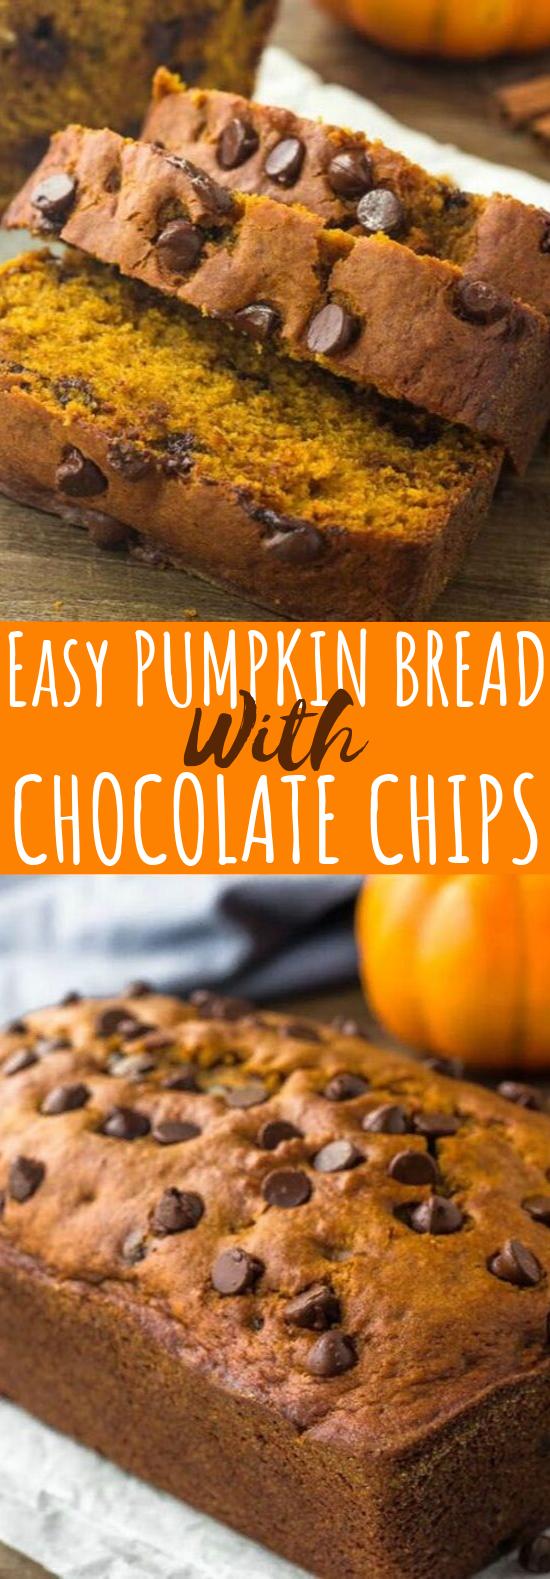 Pumpkin Chocolate Chip Bread #pumpkin #desserts